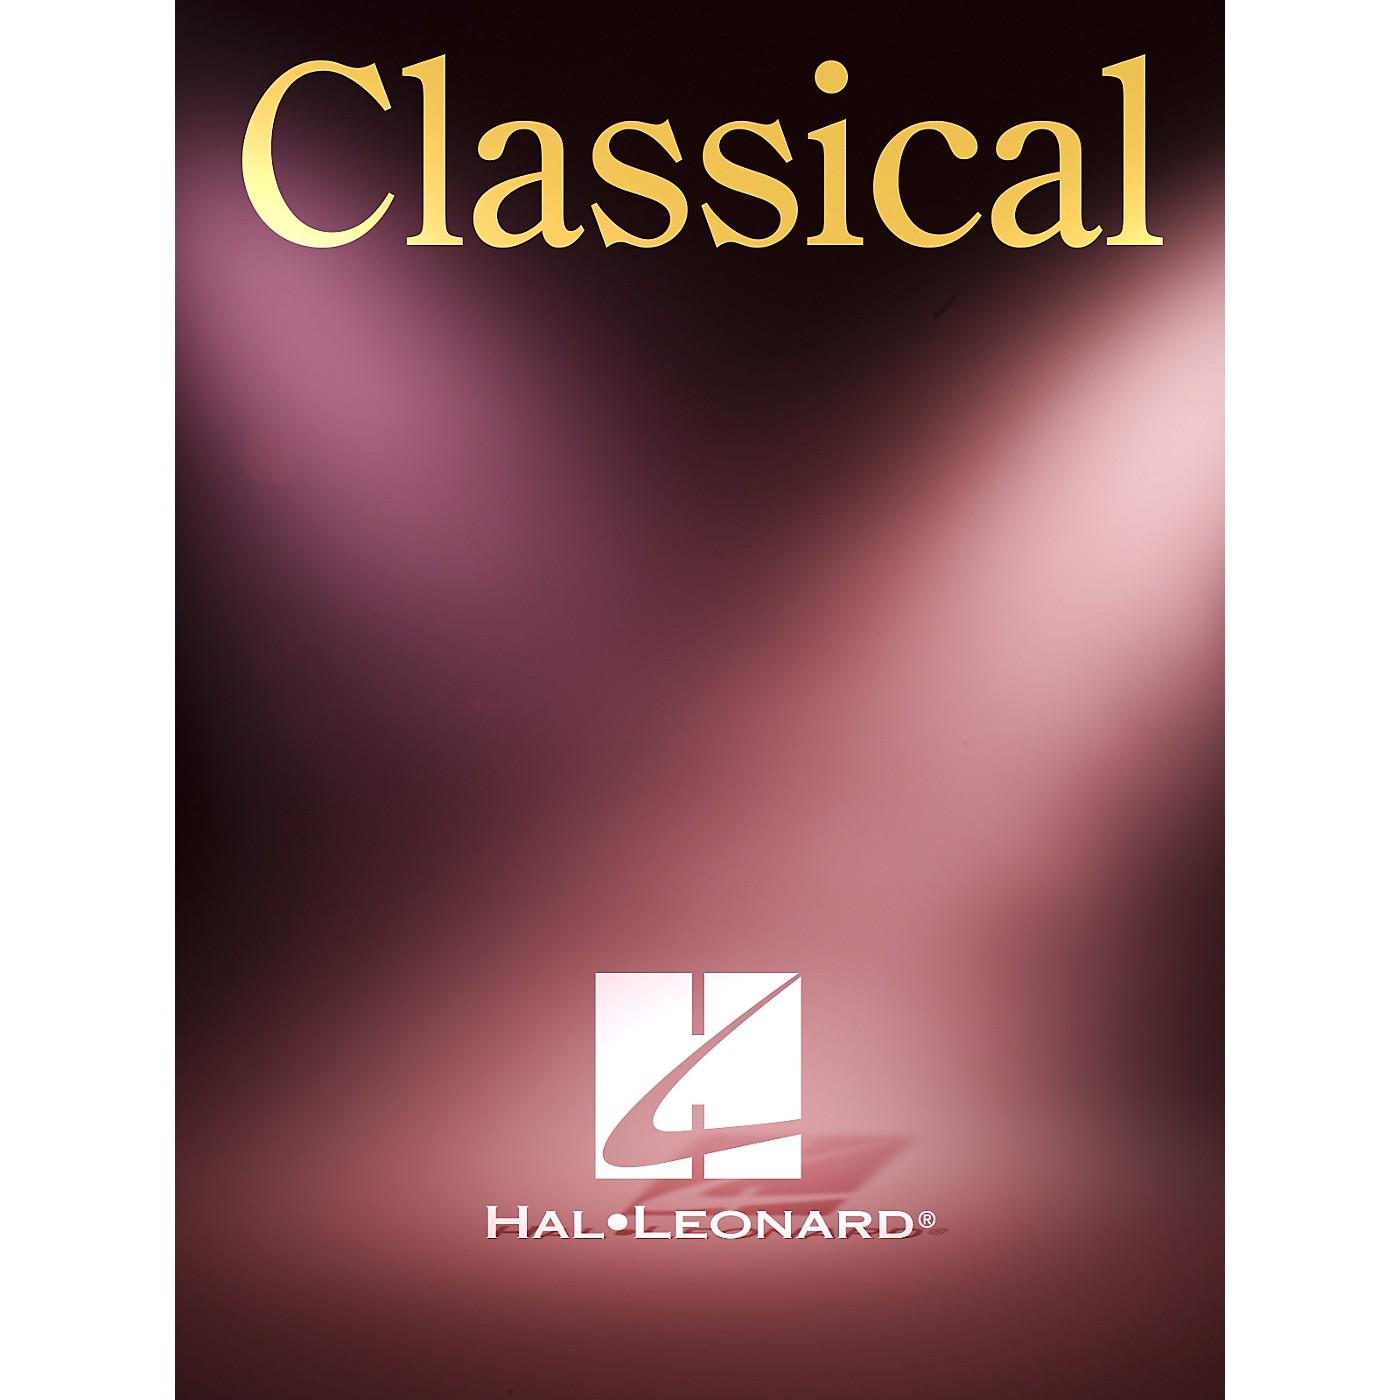 Hal Leonard Variazioni Op. 38 Suvini Zerboni Series thumbnail